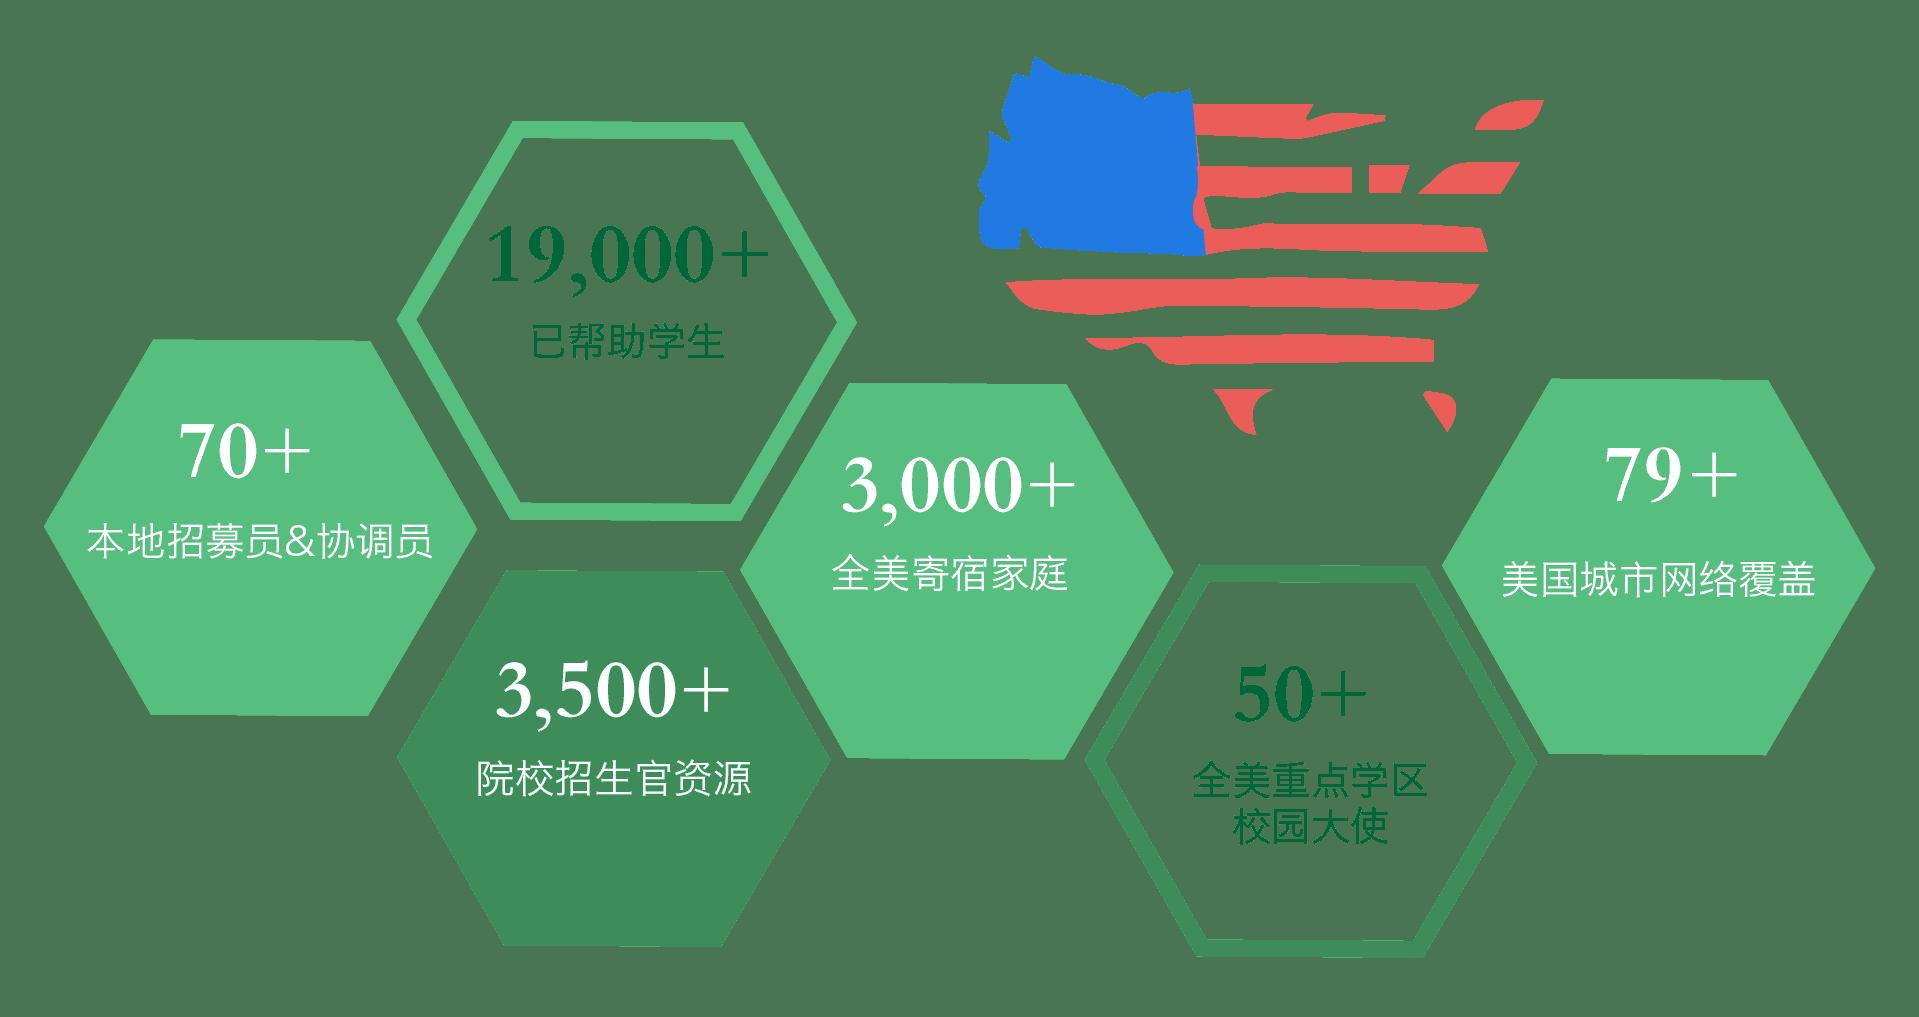 us-local-resource